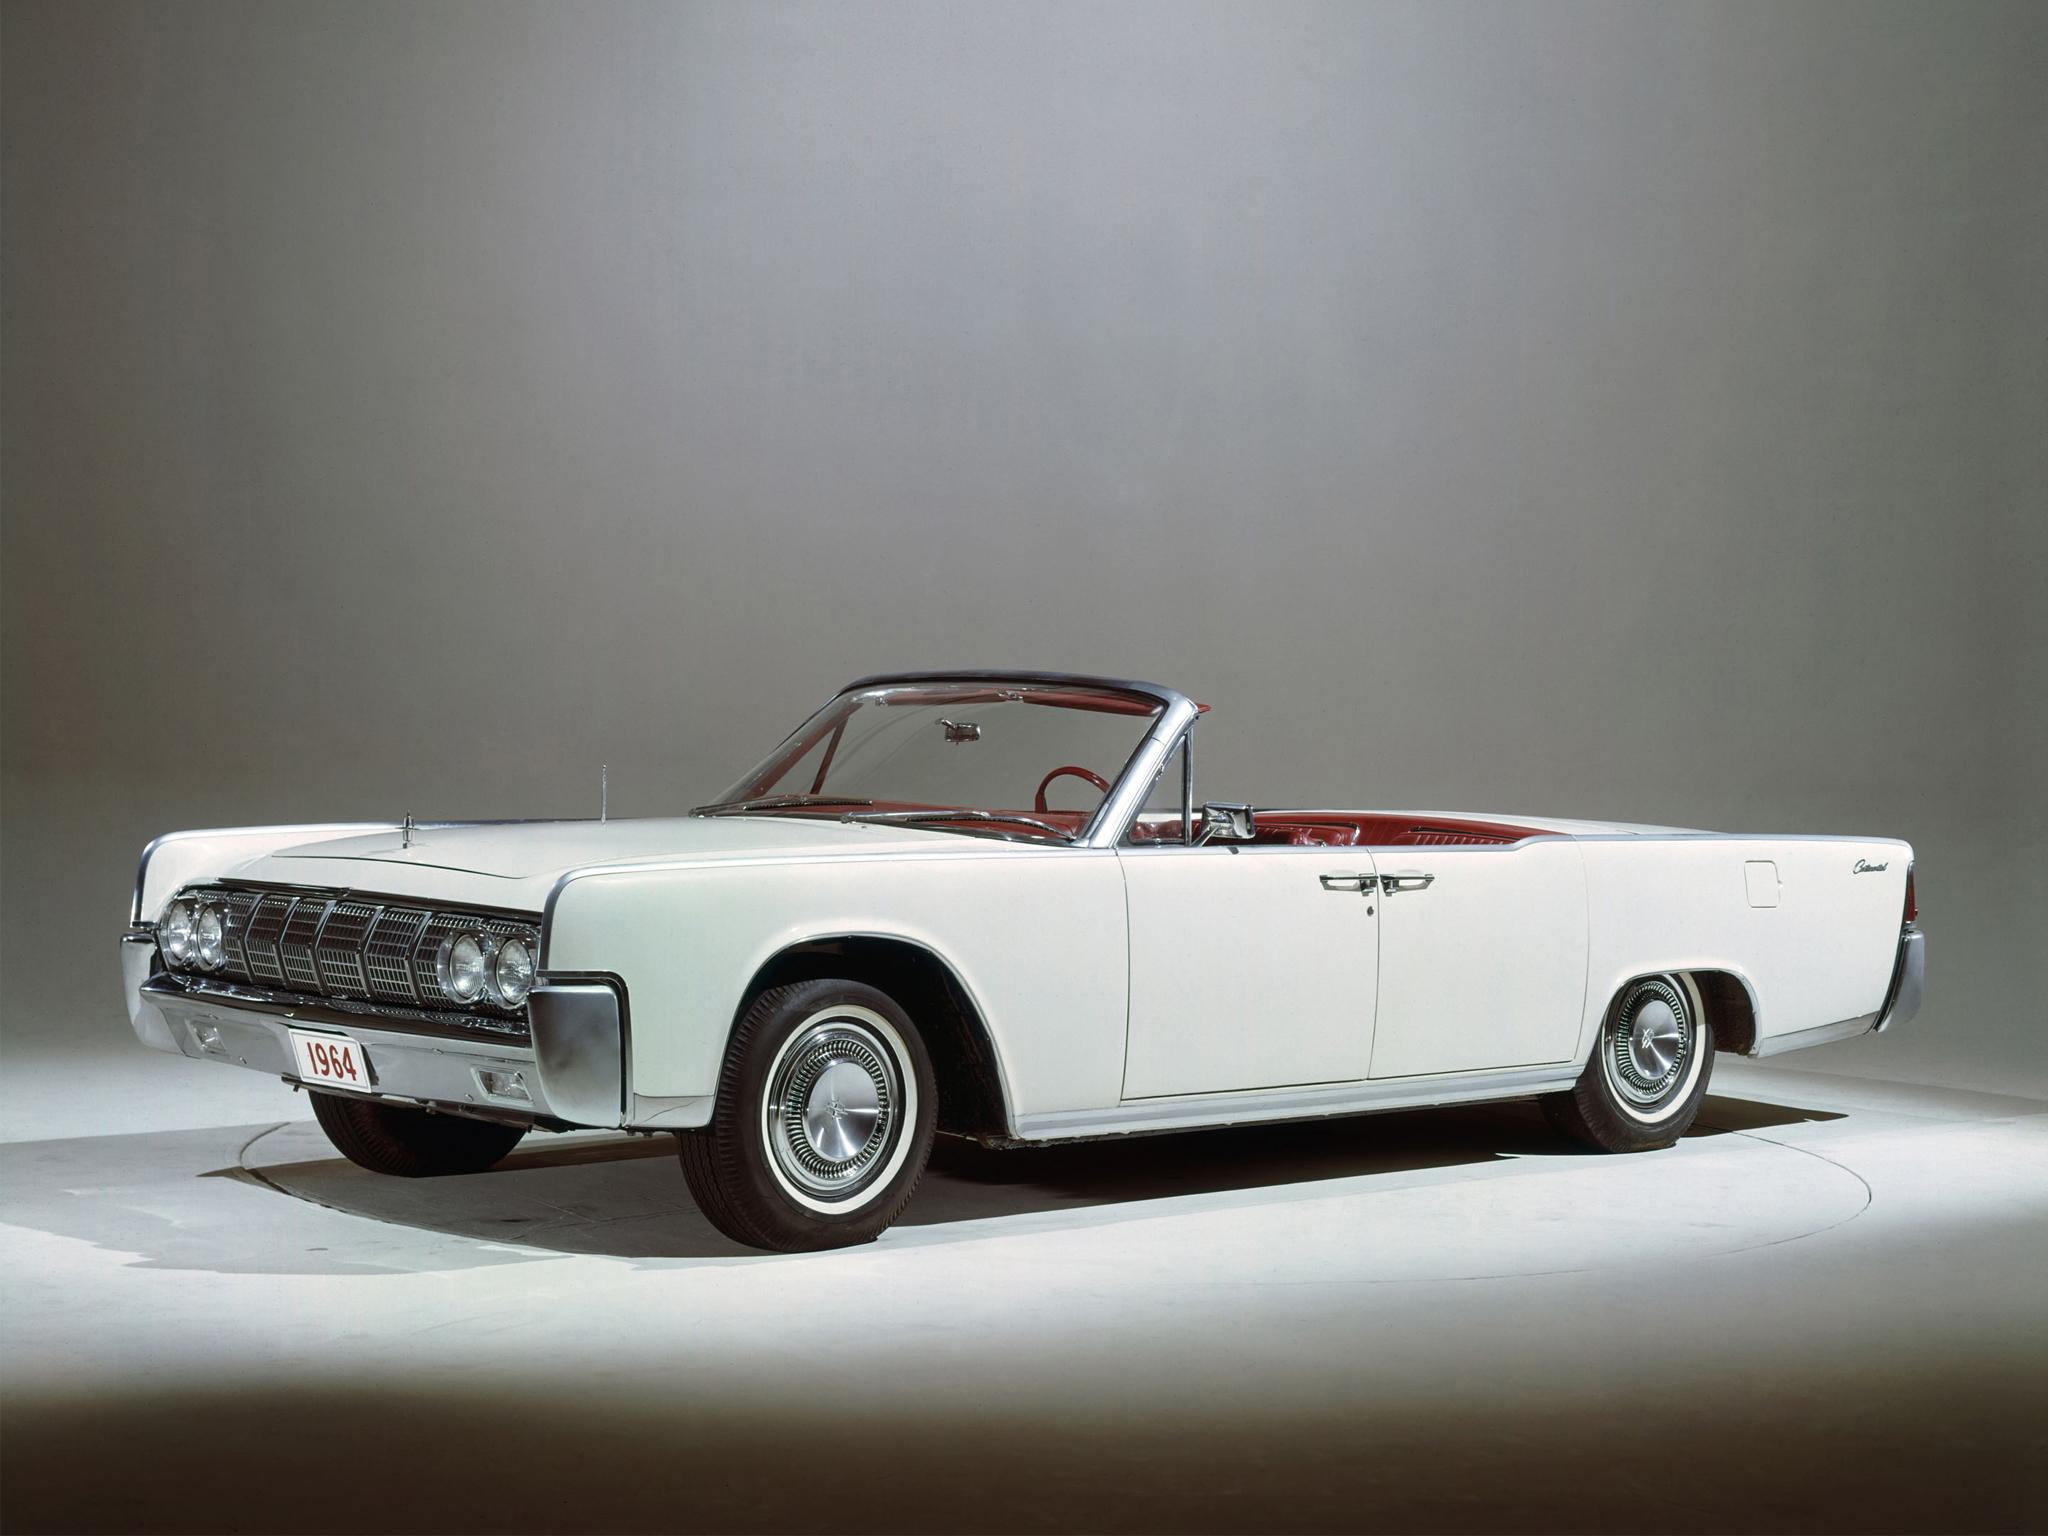 1964 lincoln continental convertible 74d wallpaper 2048x1536 153944 wallpaperup. Black Bedroom Furniture Sets. Home Design Ideas